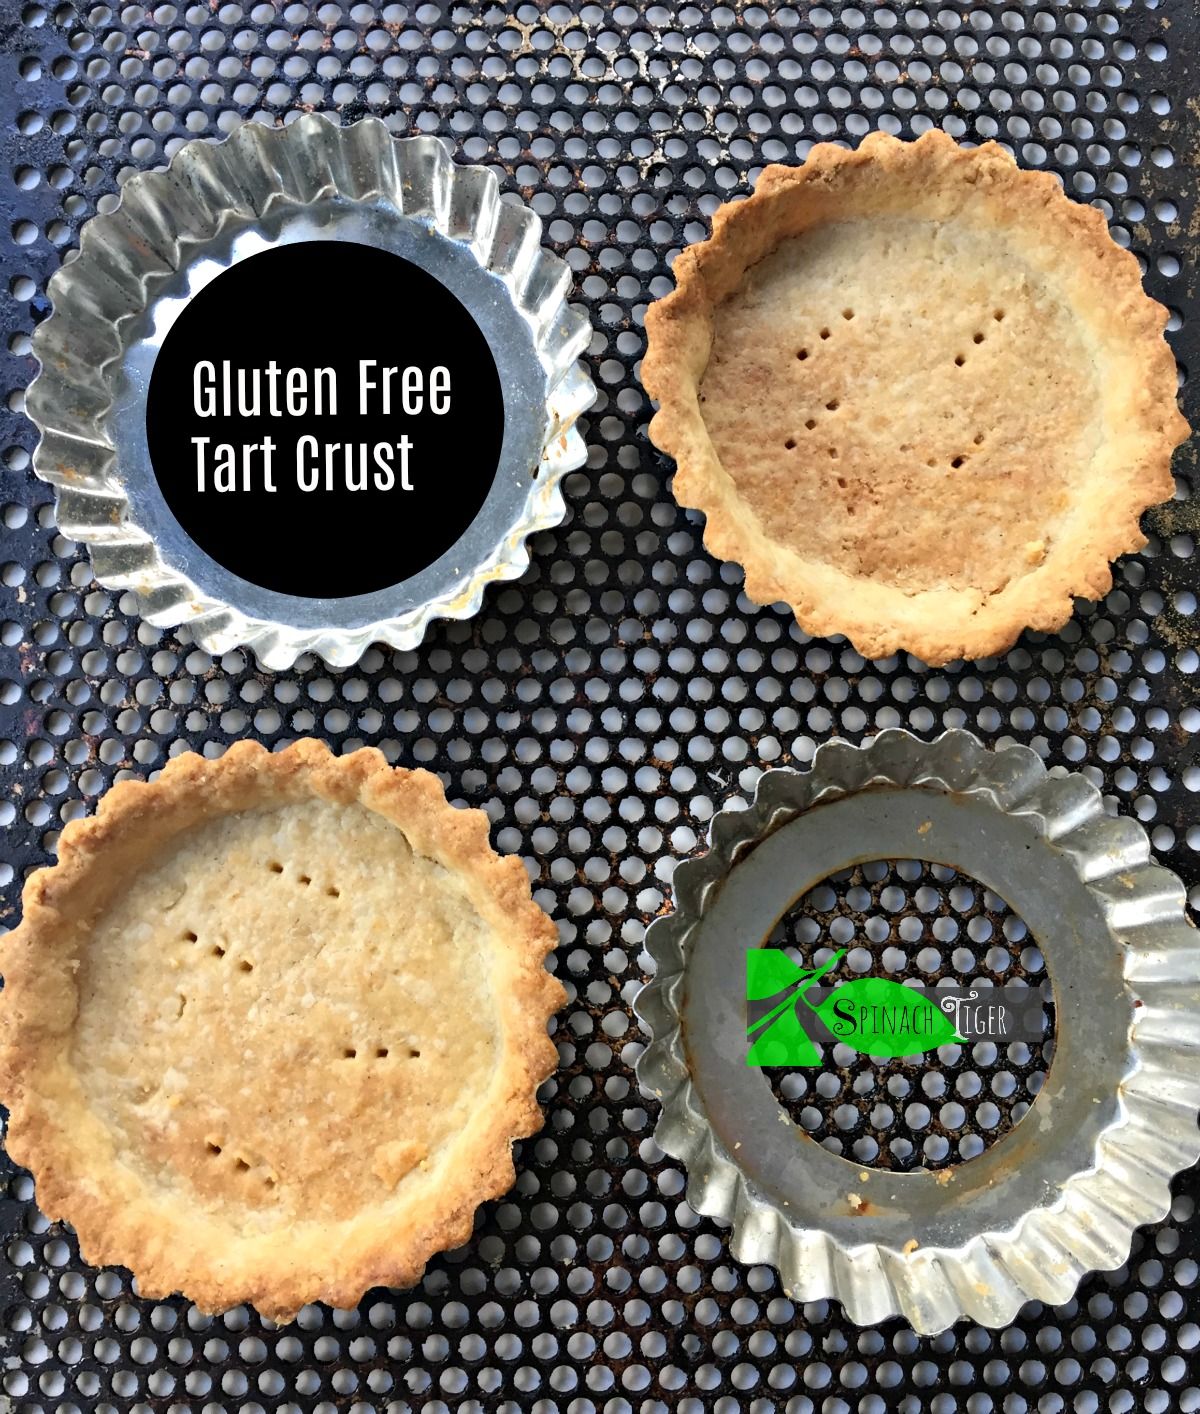 Make gluten free tart crust recipe, gluten free pie crust recipe that tastes just like pastry dough with rice flour gluten free mix. #glutenfreetartcrust #glutenfree #tartcrust via @angelaroberts